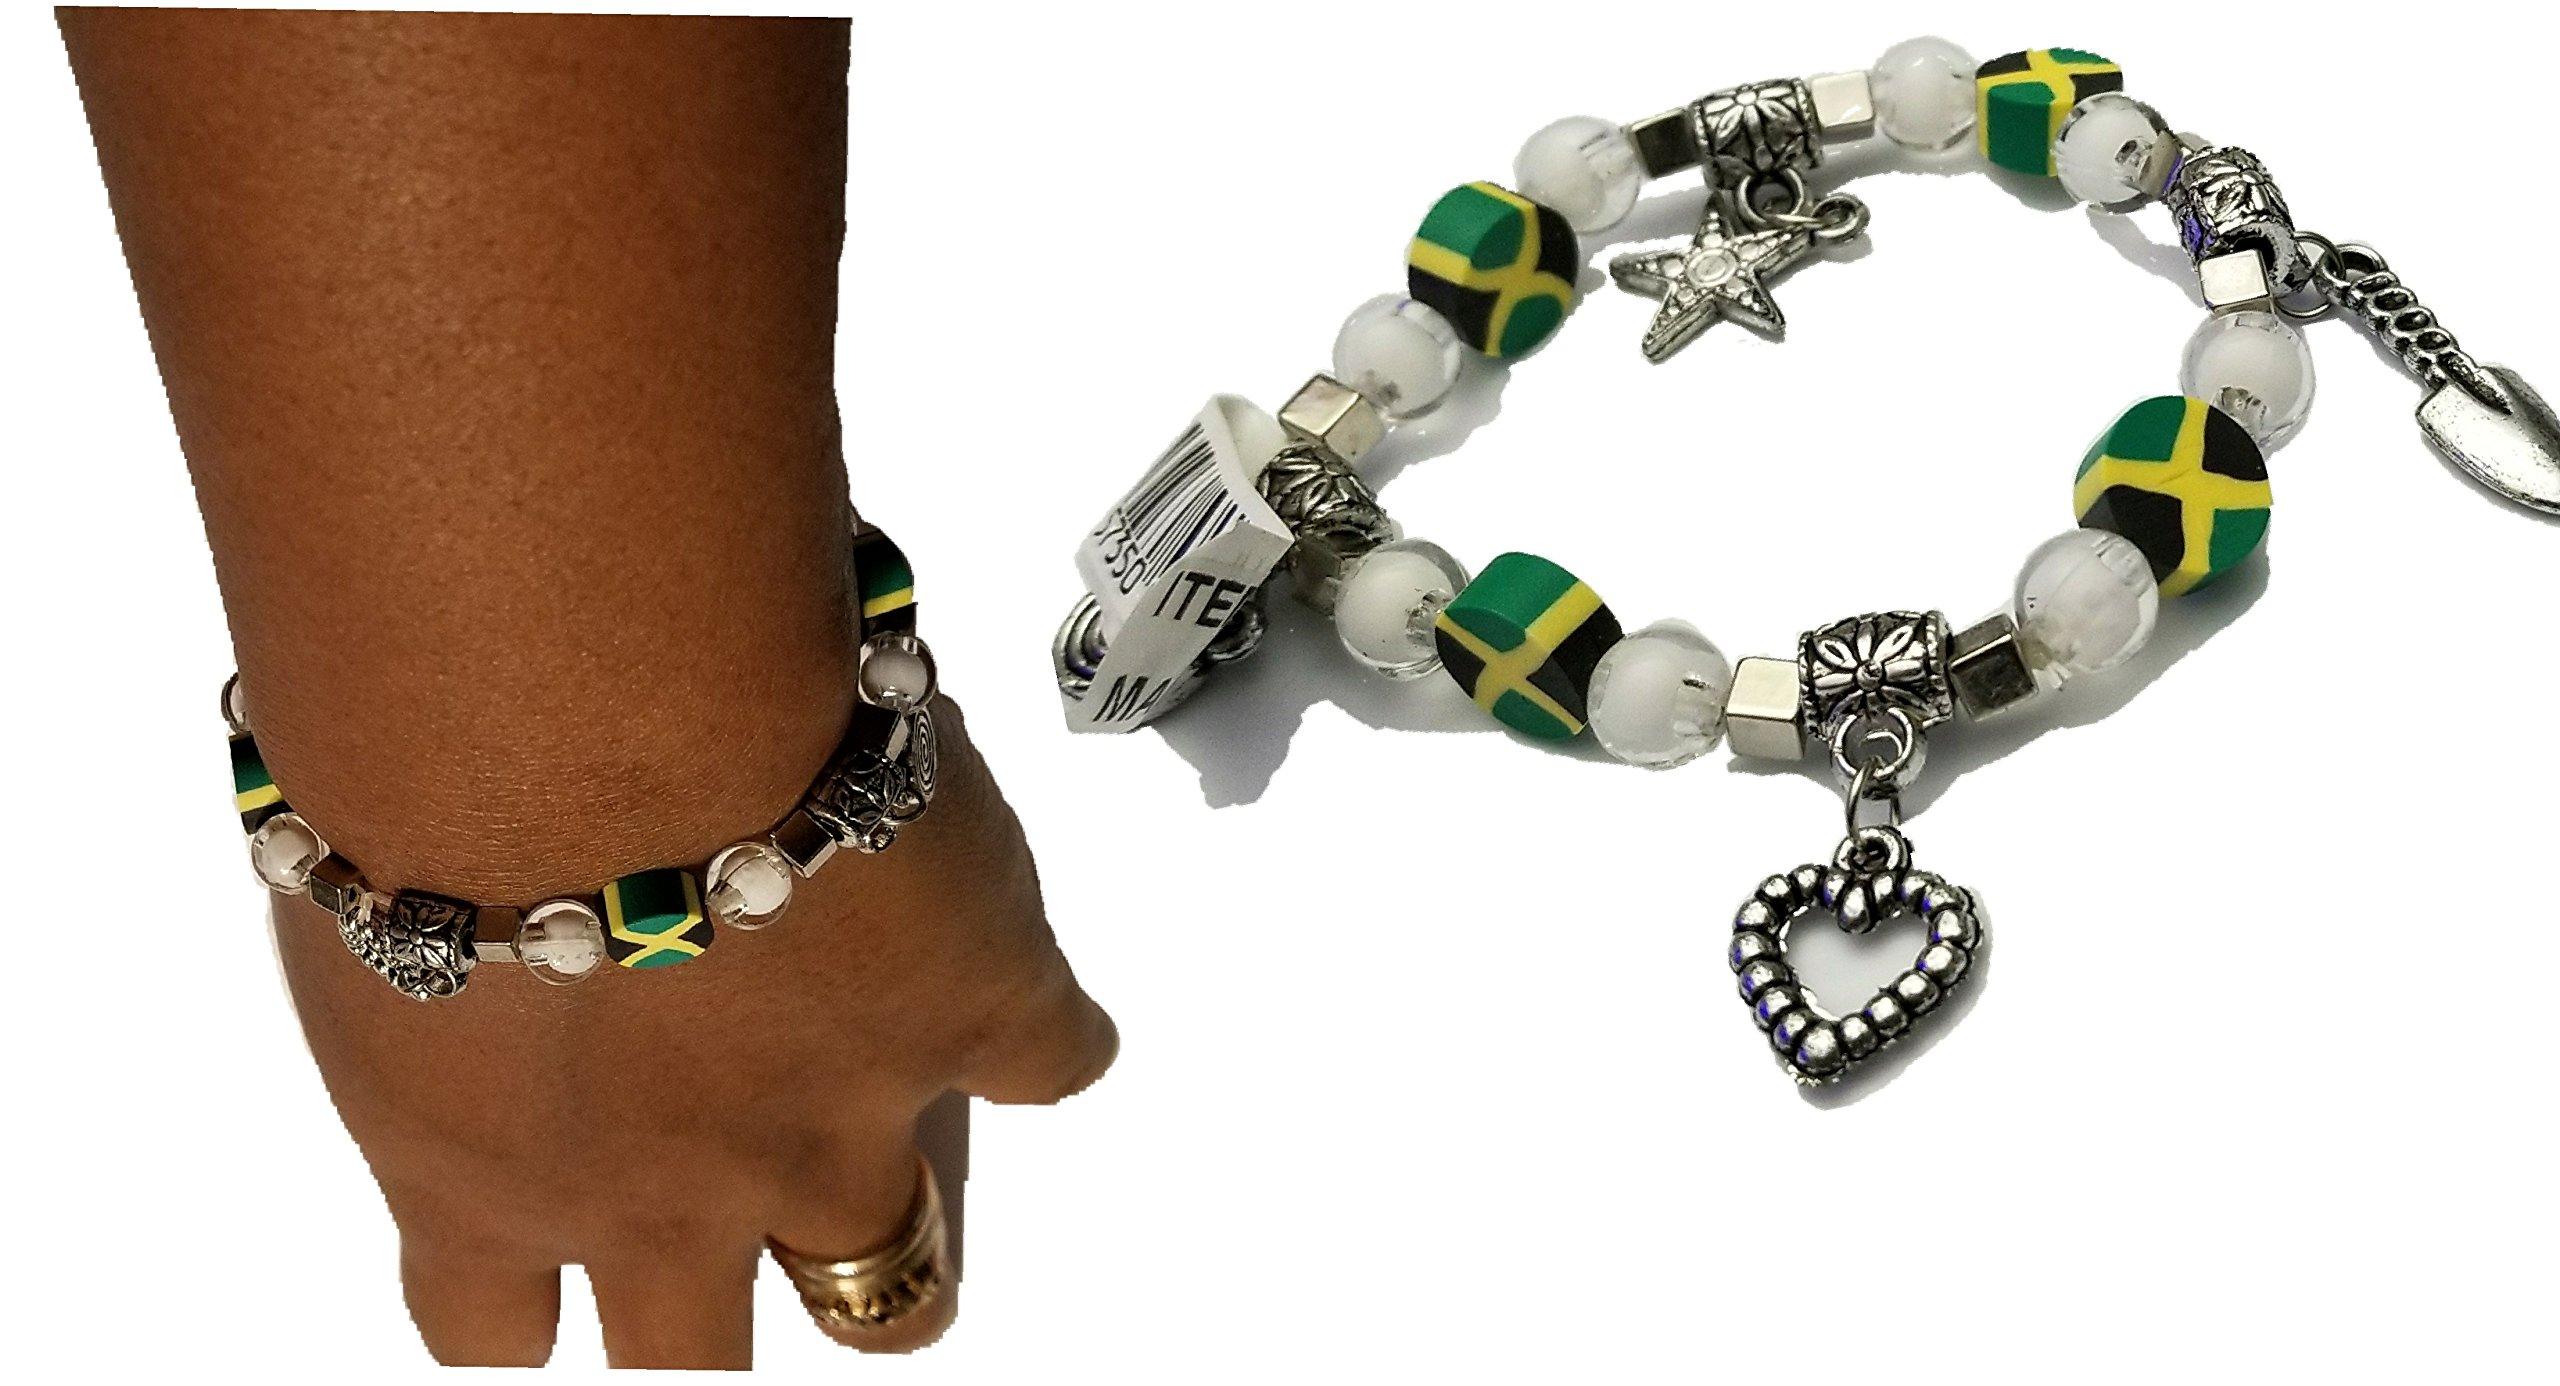 BUNFIREs Women Jamaica Jamaican Flag Bracelets Jewelry (Bracelet Charm) by BUNFIREs (Image #3)